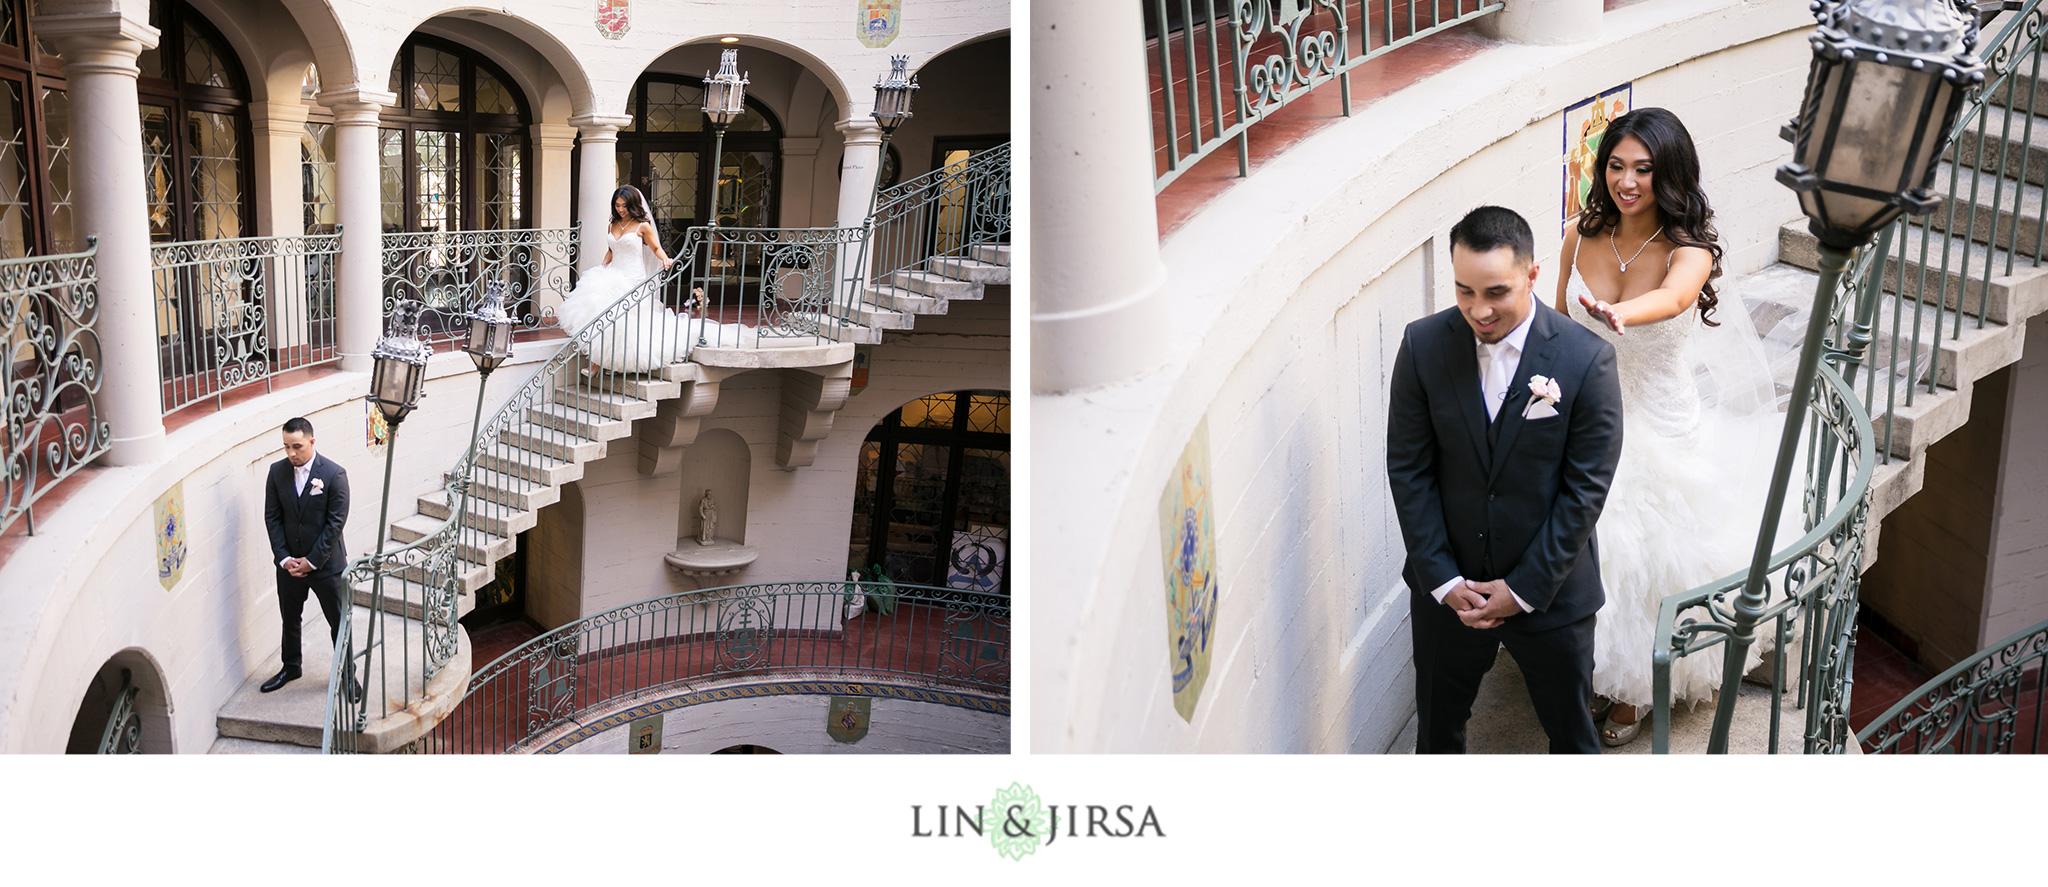 09-mission-inn-riverside-wedding-photography